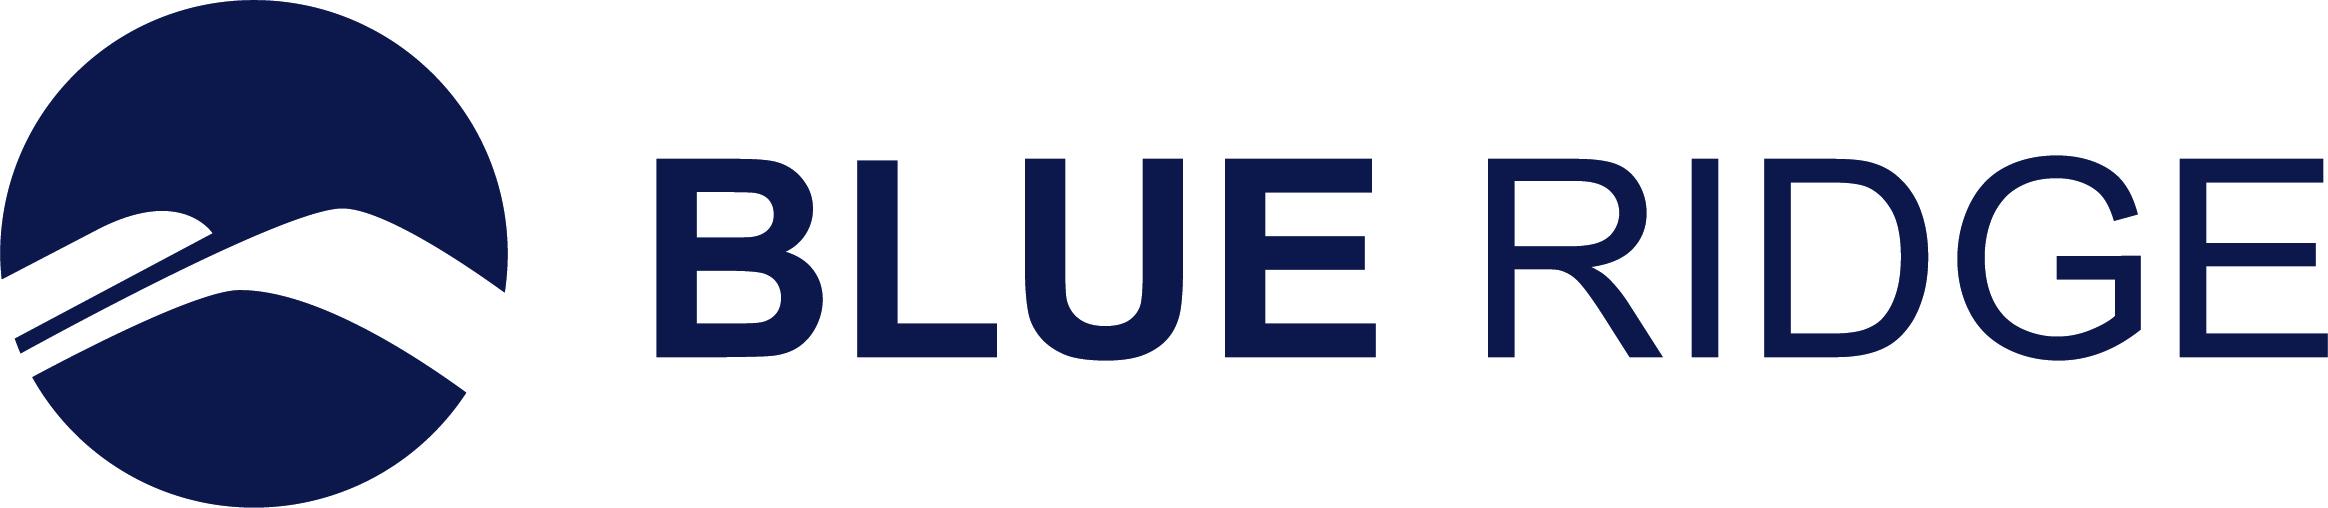 Blue Ridge CMO Ed Rusch Talks Marketing as Member of Forbes Council